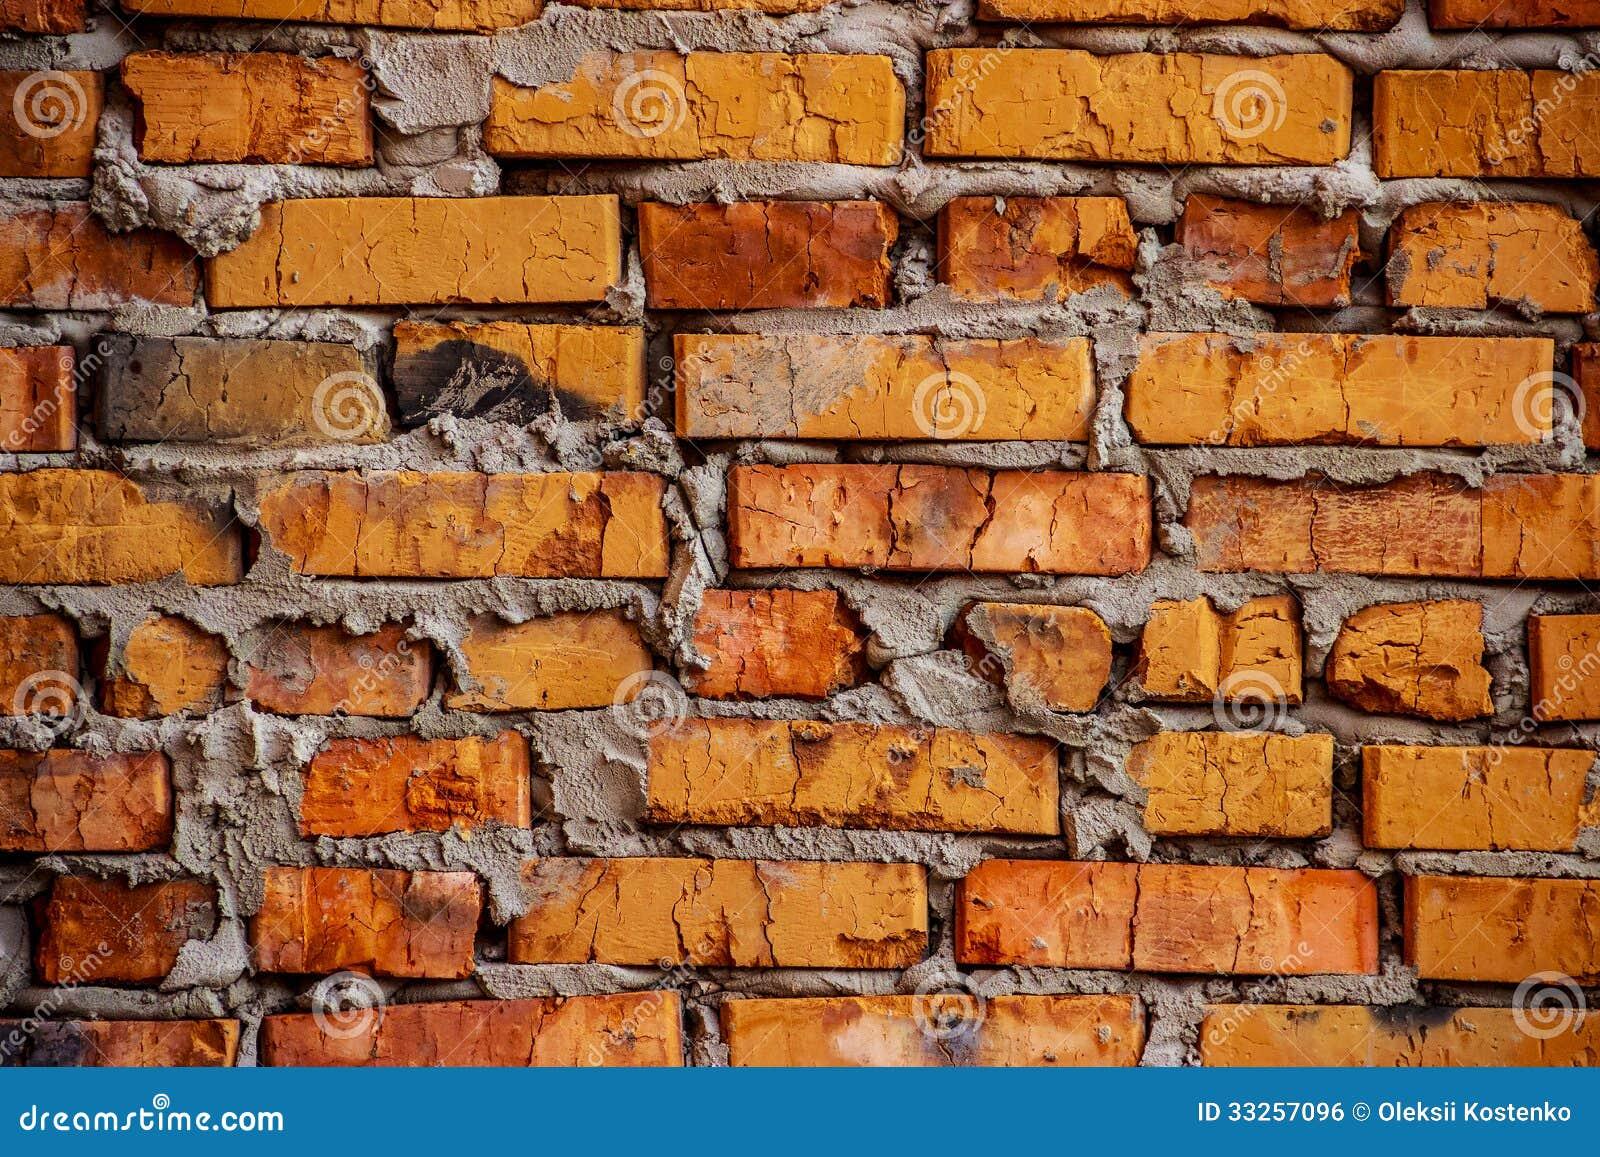 Rustic Orange Brick Wall Background Royalty Free Stock